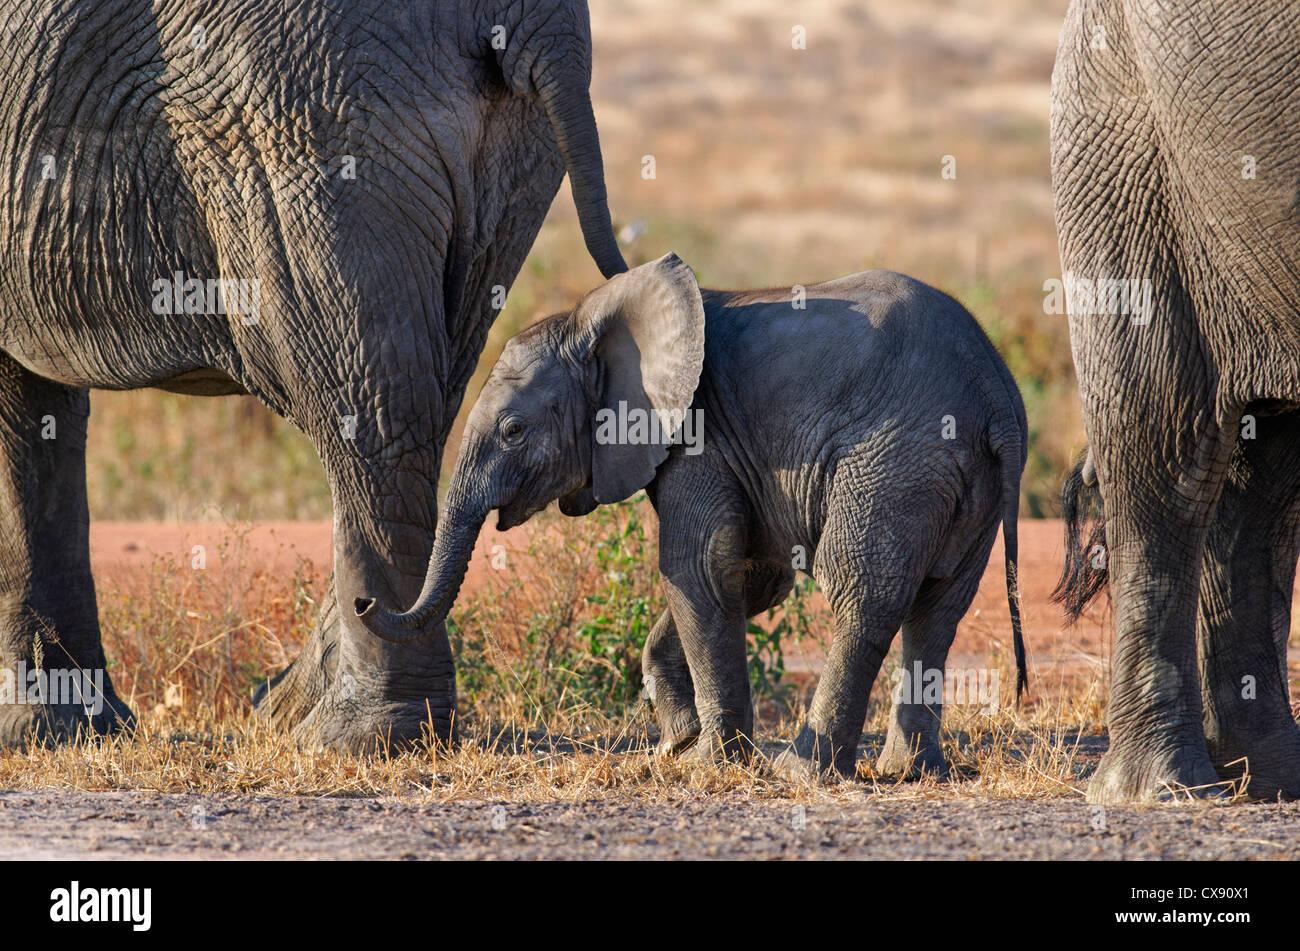 Family of elephants - Stock Image